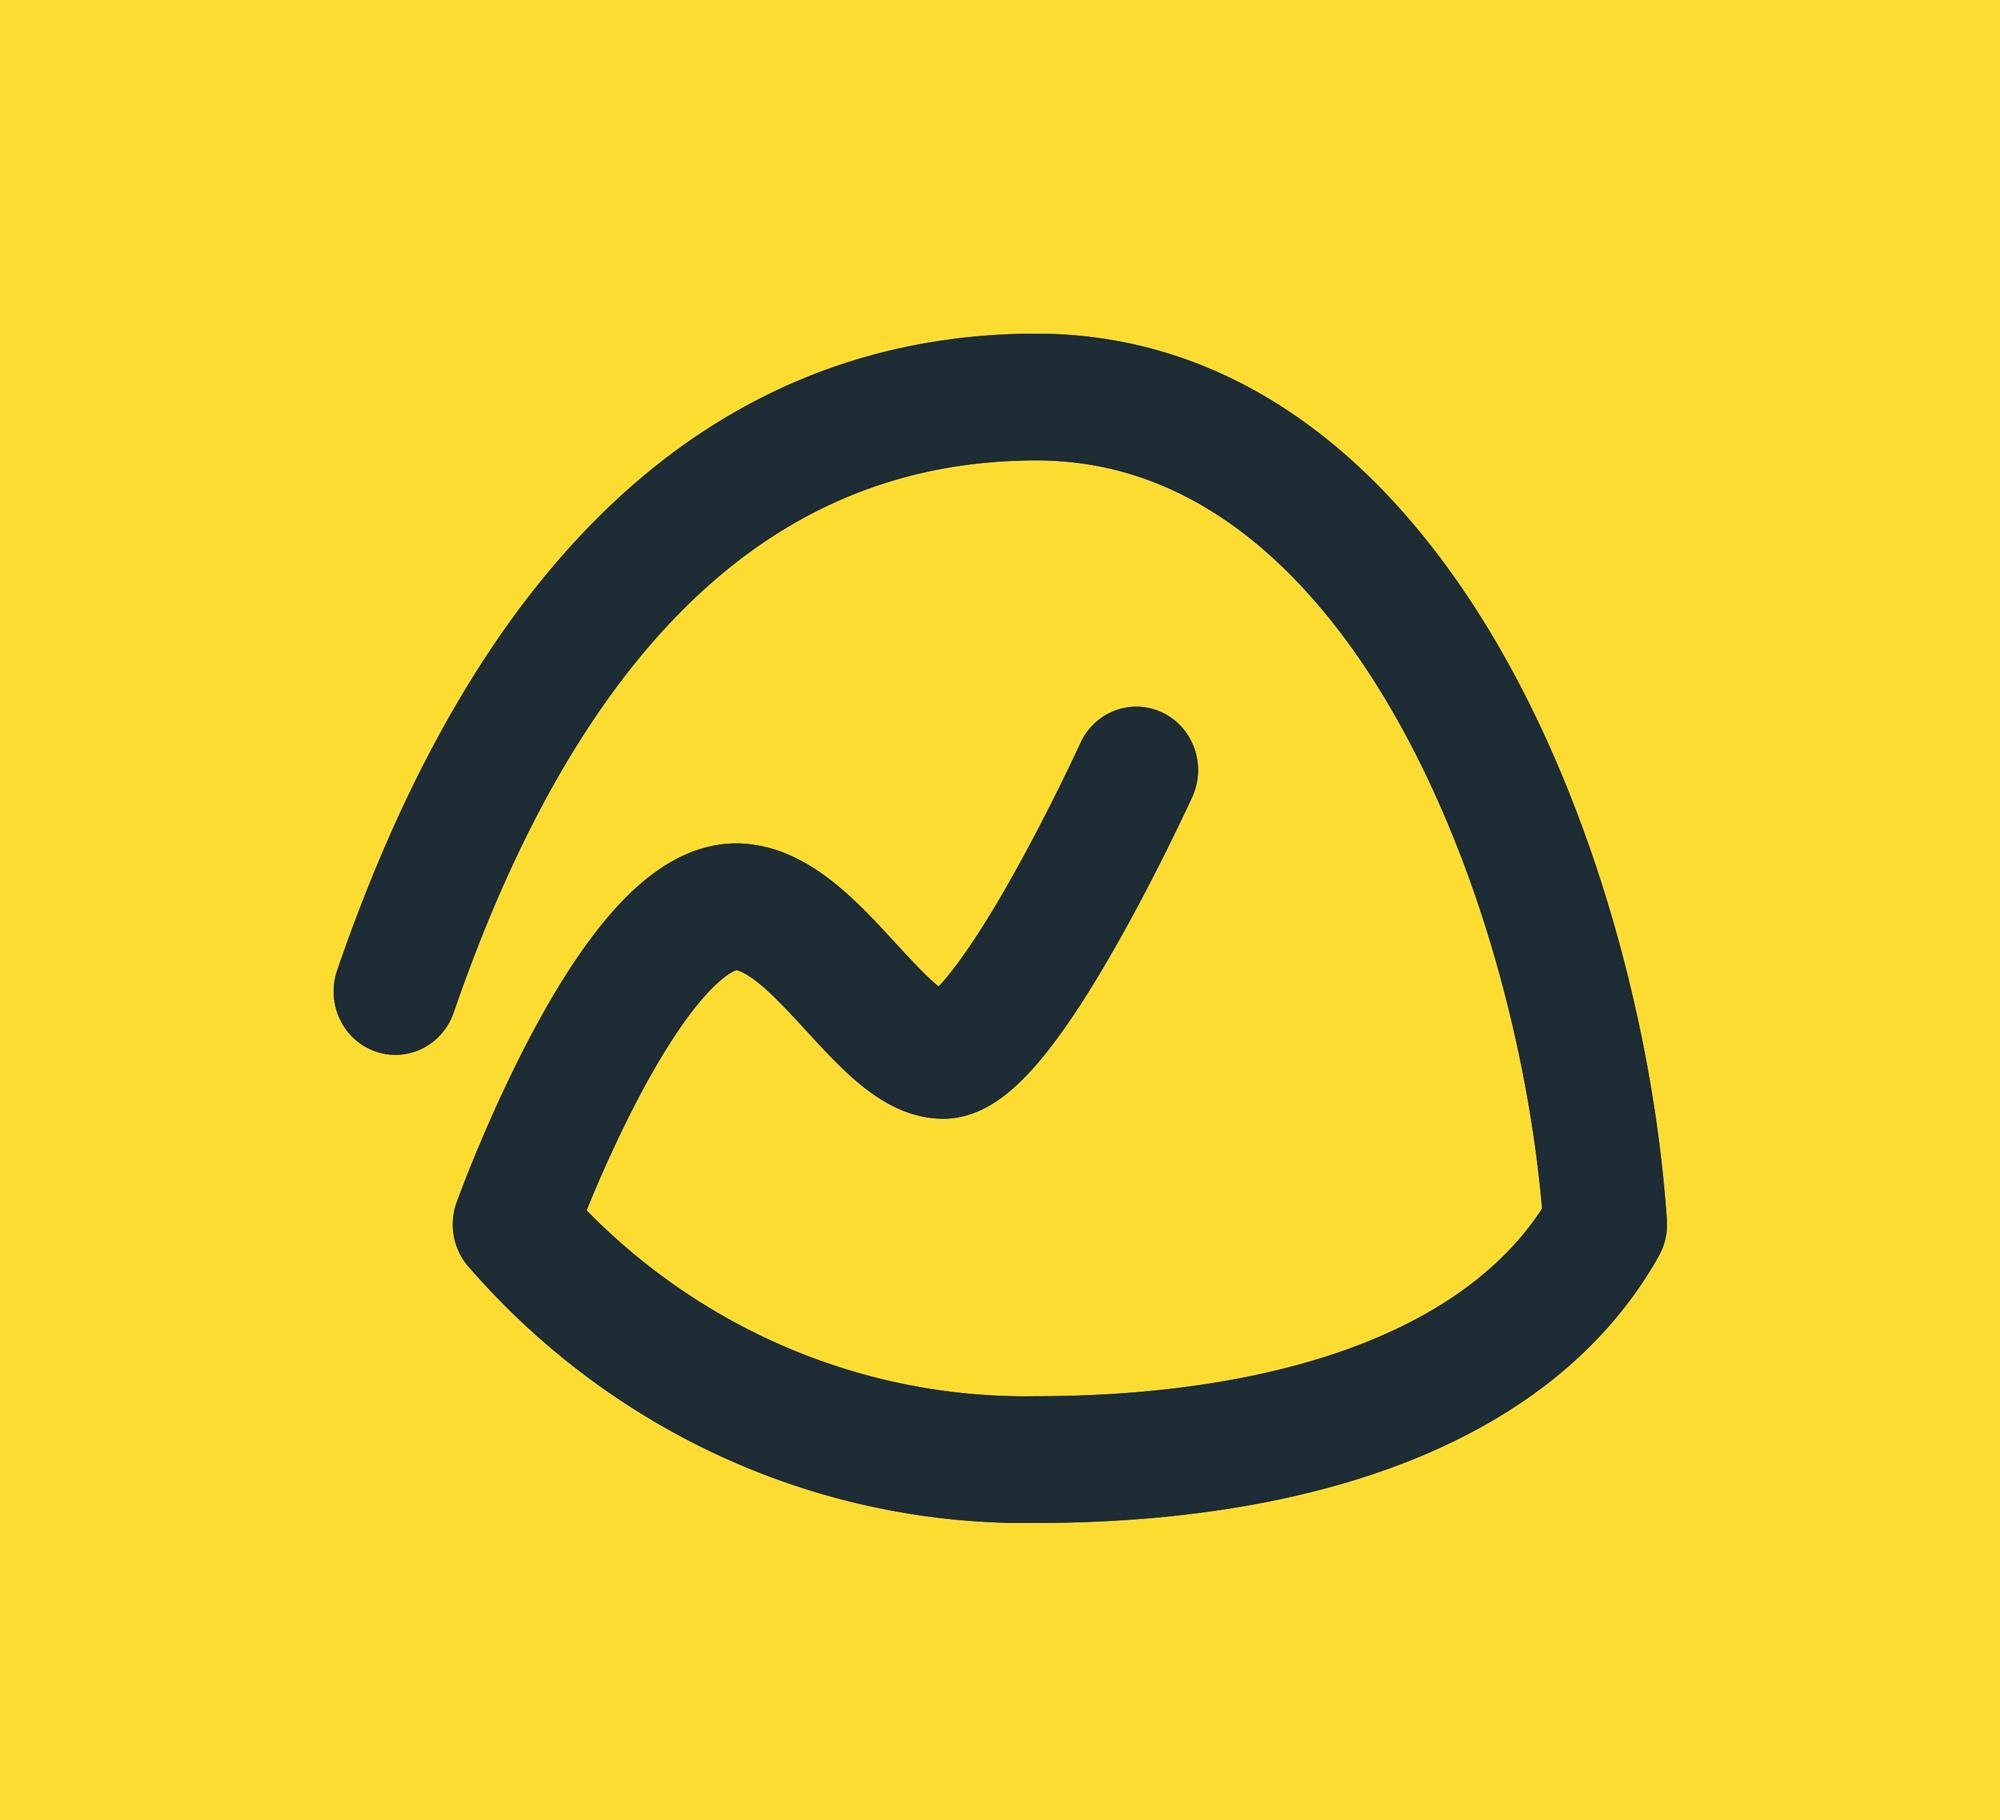 basecamp new logo 2019